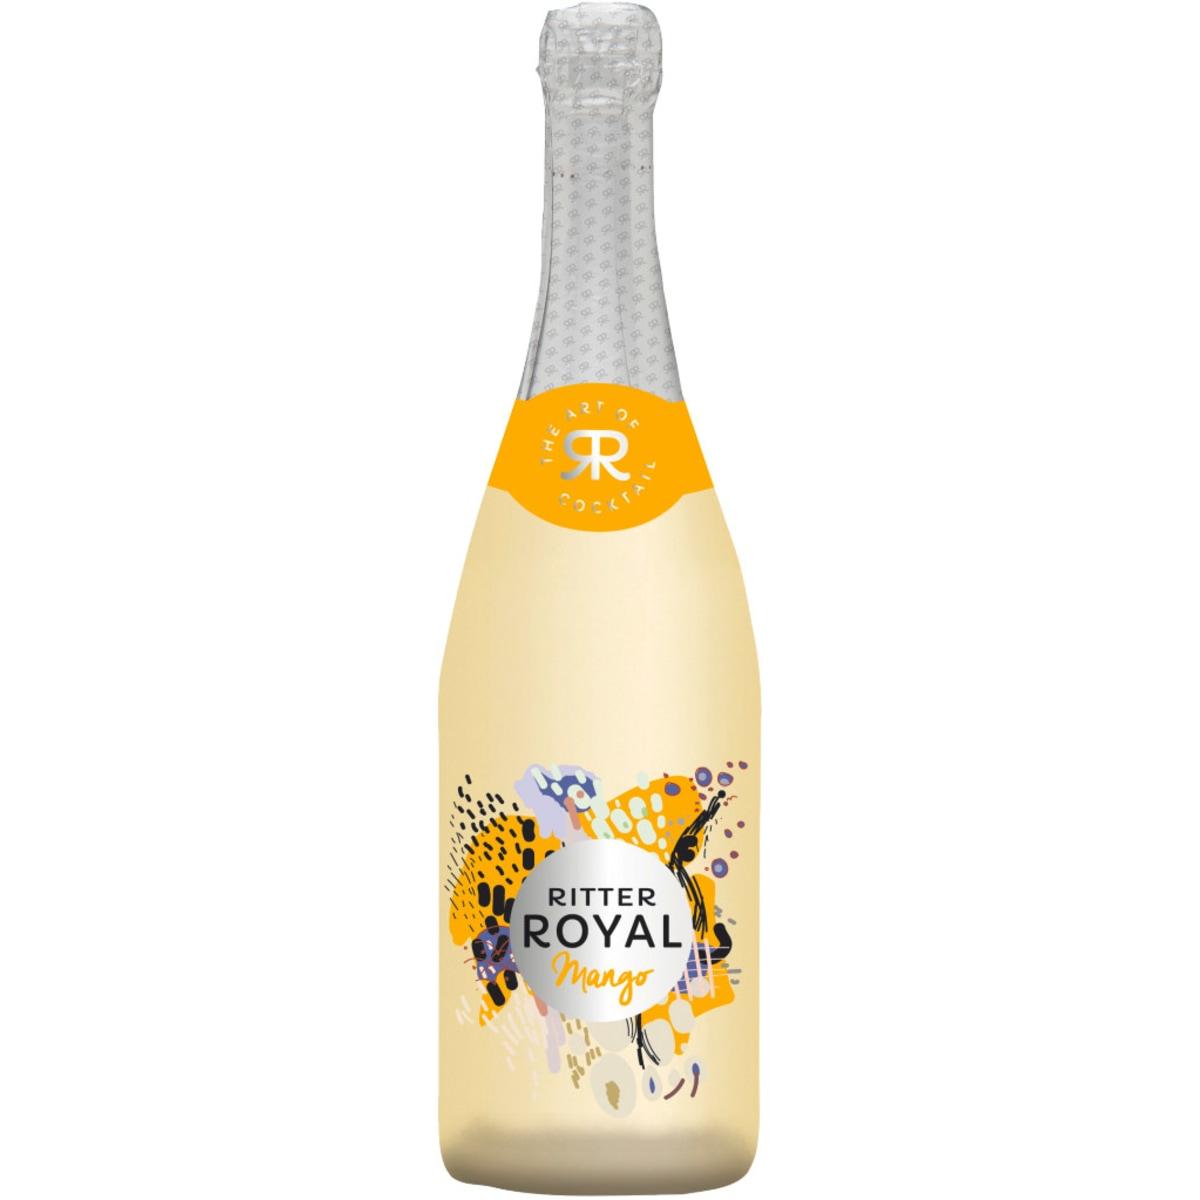 Ritter Royal Mango 0,75 l